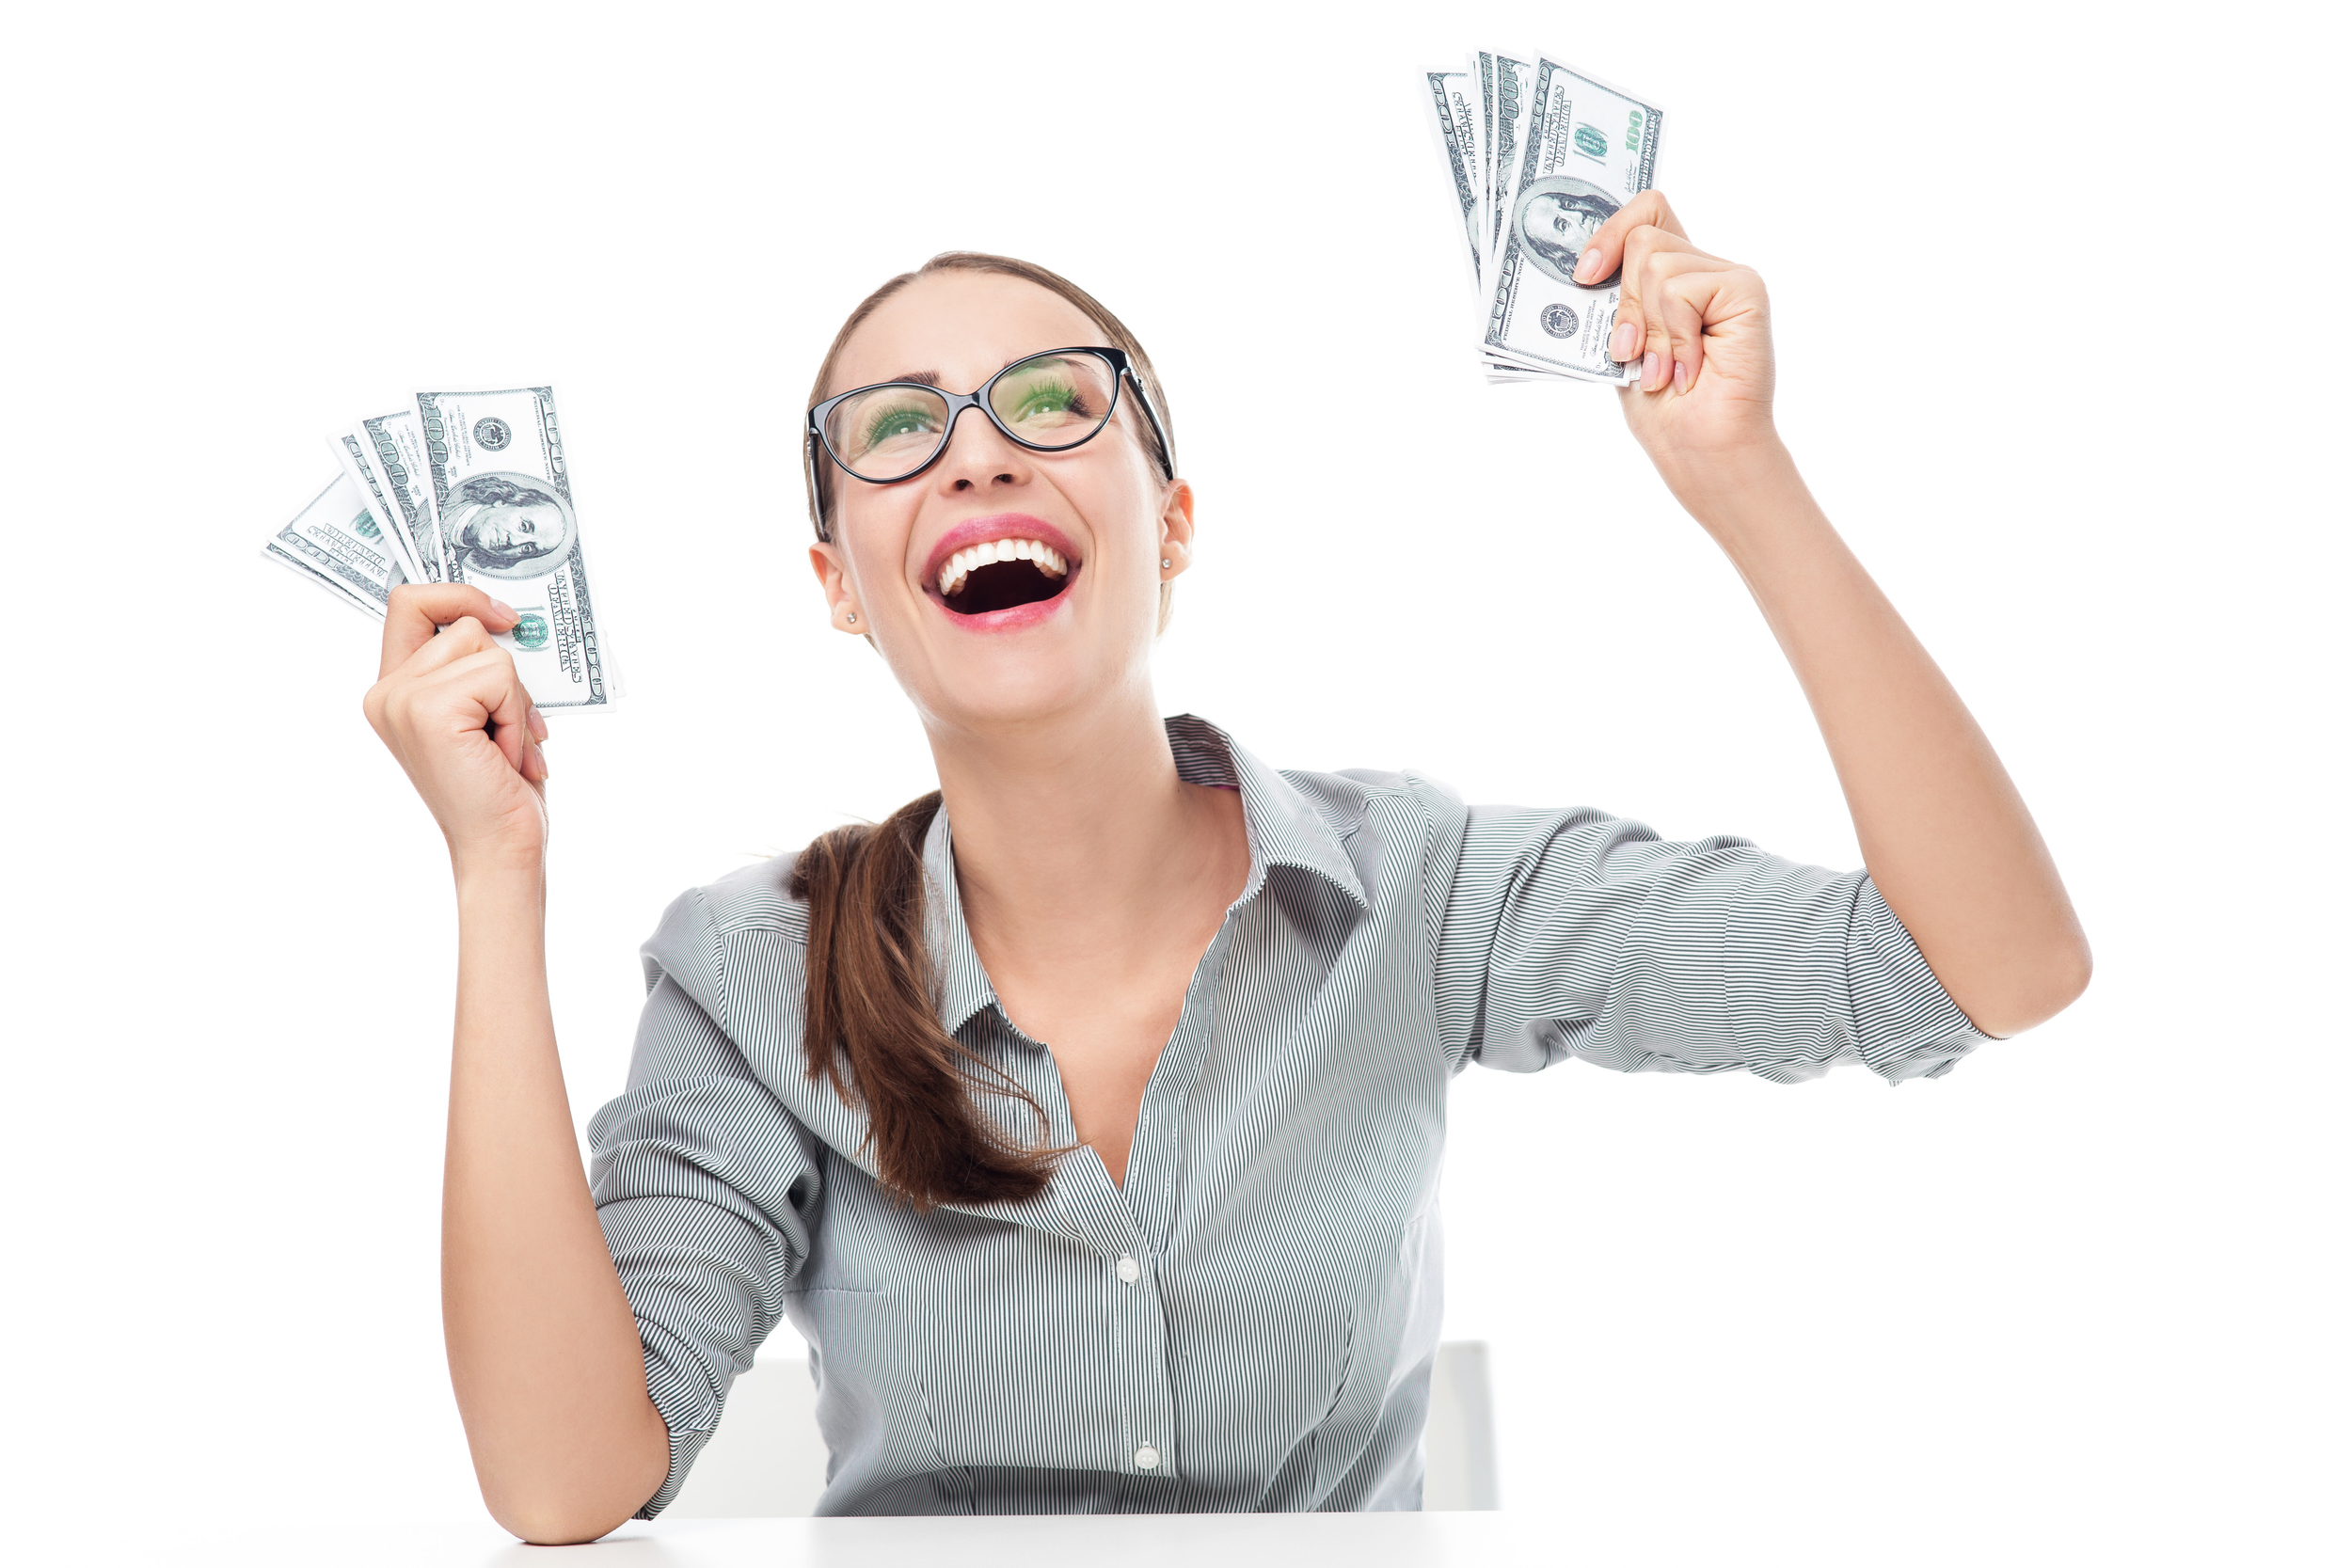 bigstock-Young-businesswoman-holding-mo-54168545.jpg